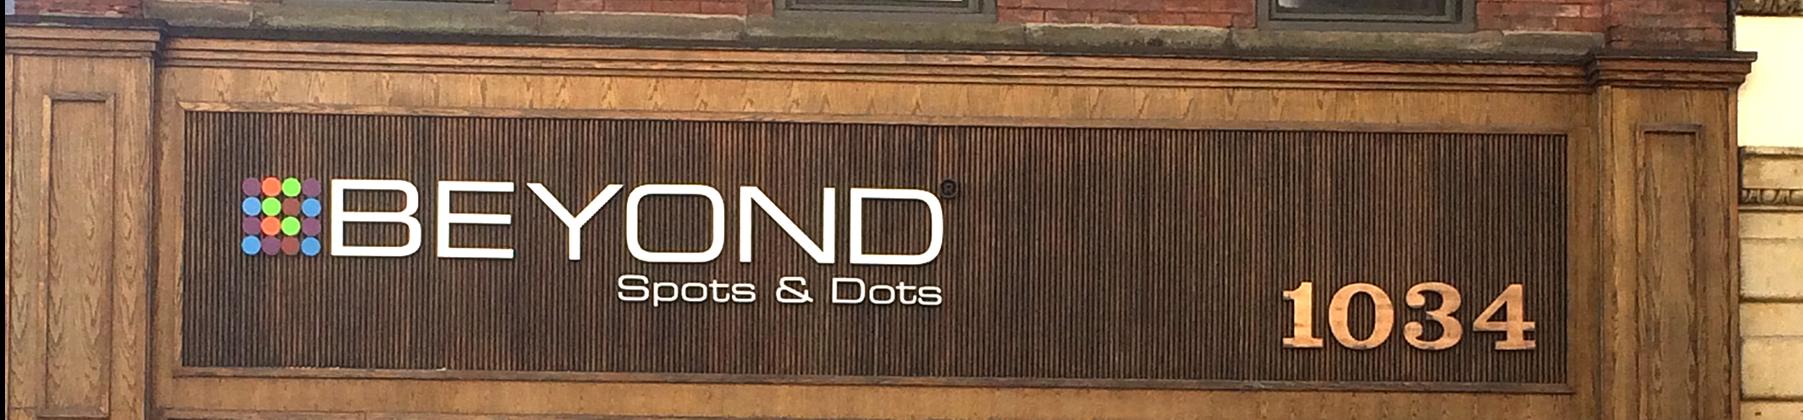 Beyond Spots & Dots Branded Signage